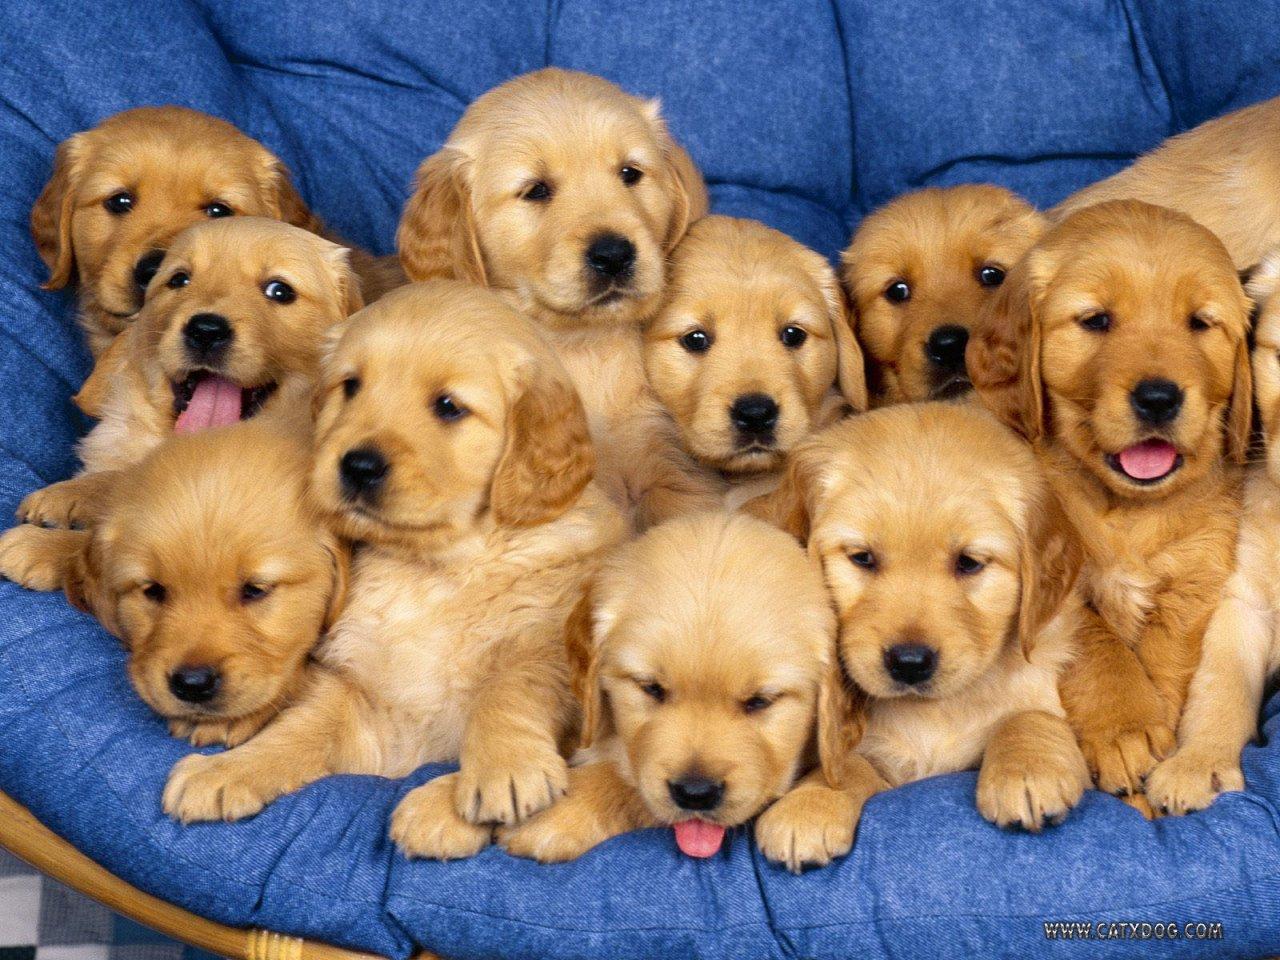 golden retreiver puppies.jpg